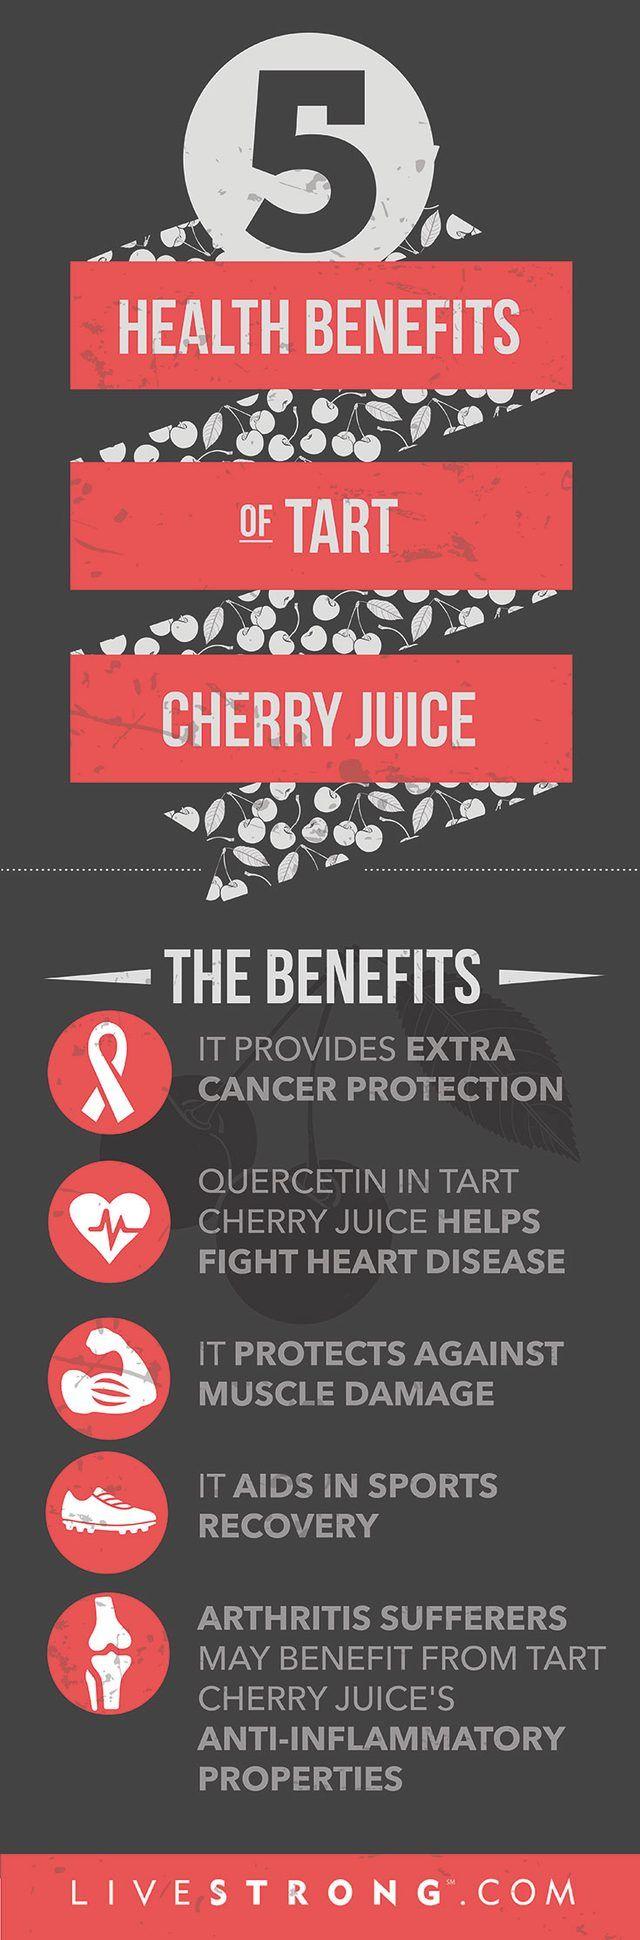 5 Promising Health Benefits of Tart Cherry Juice